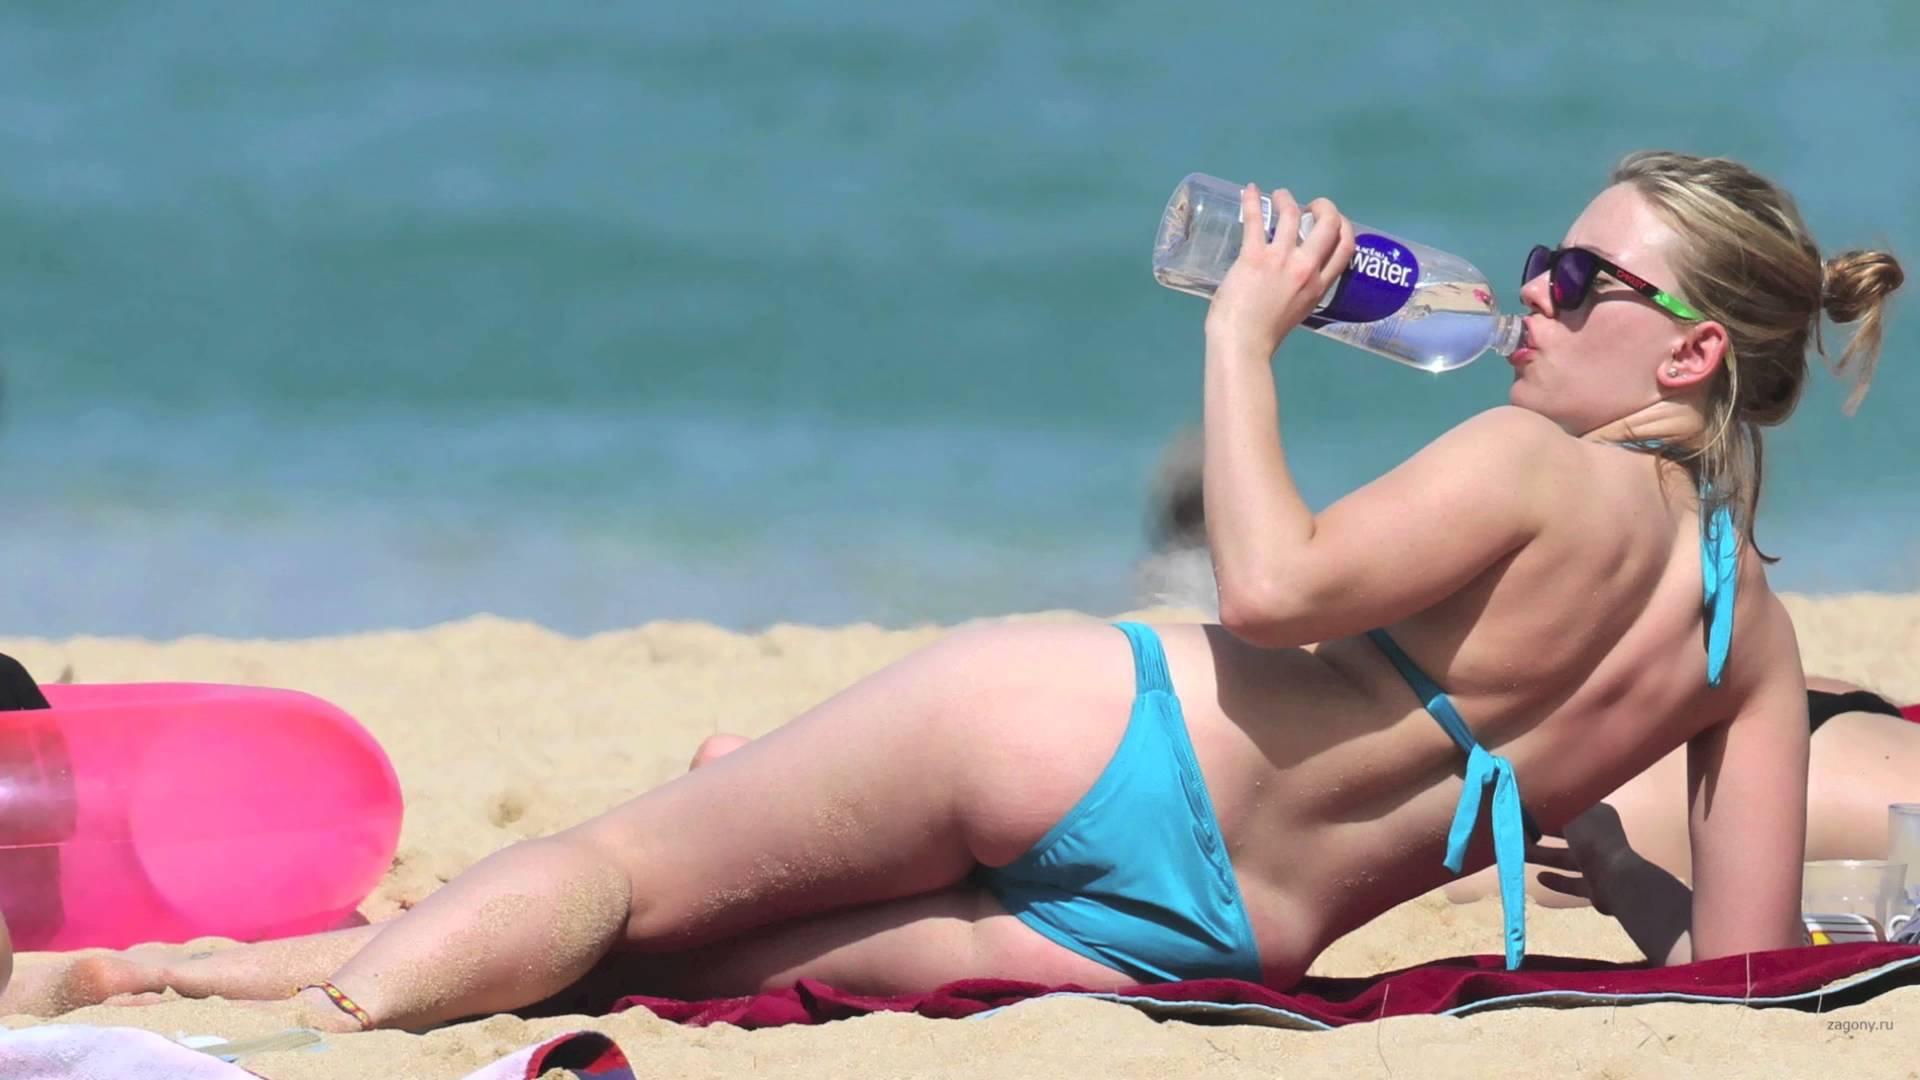 Nude scarlett beach johansson Scarlett Johansson